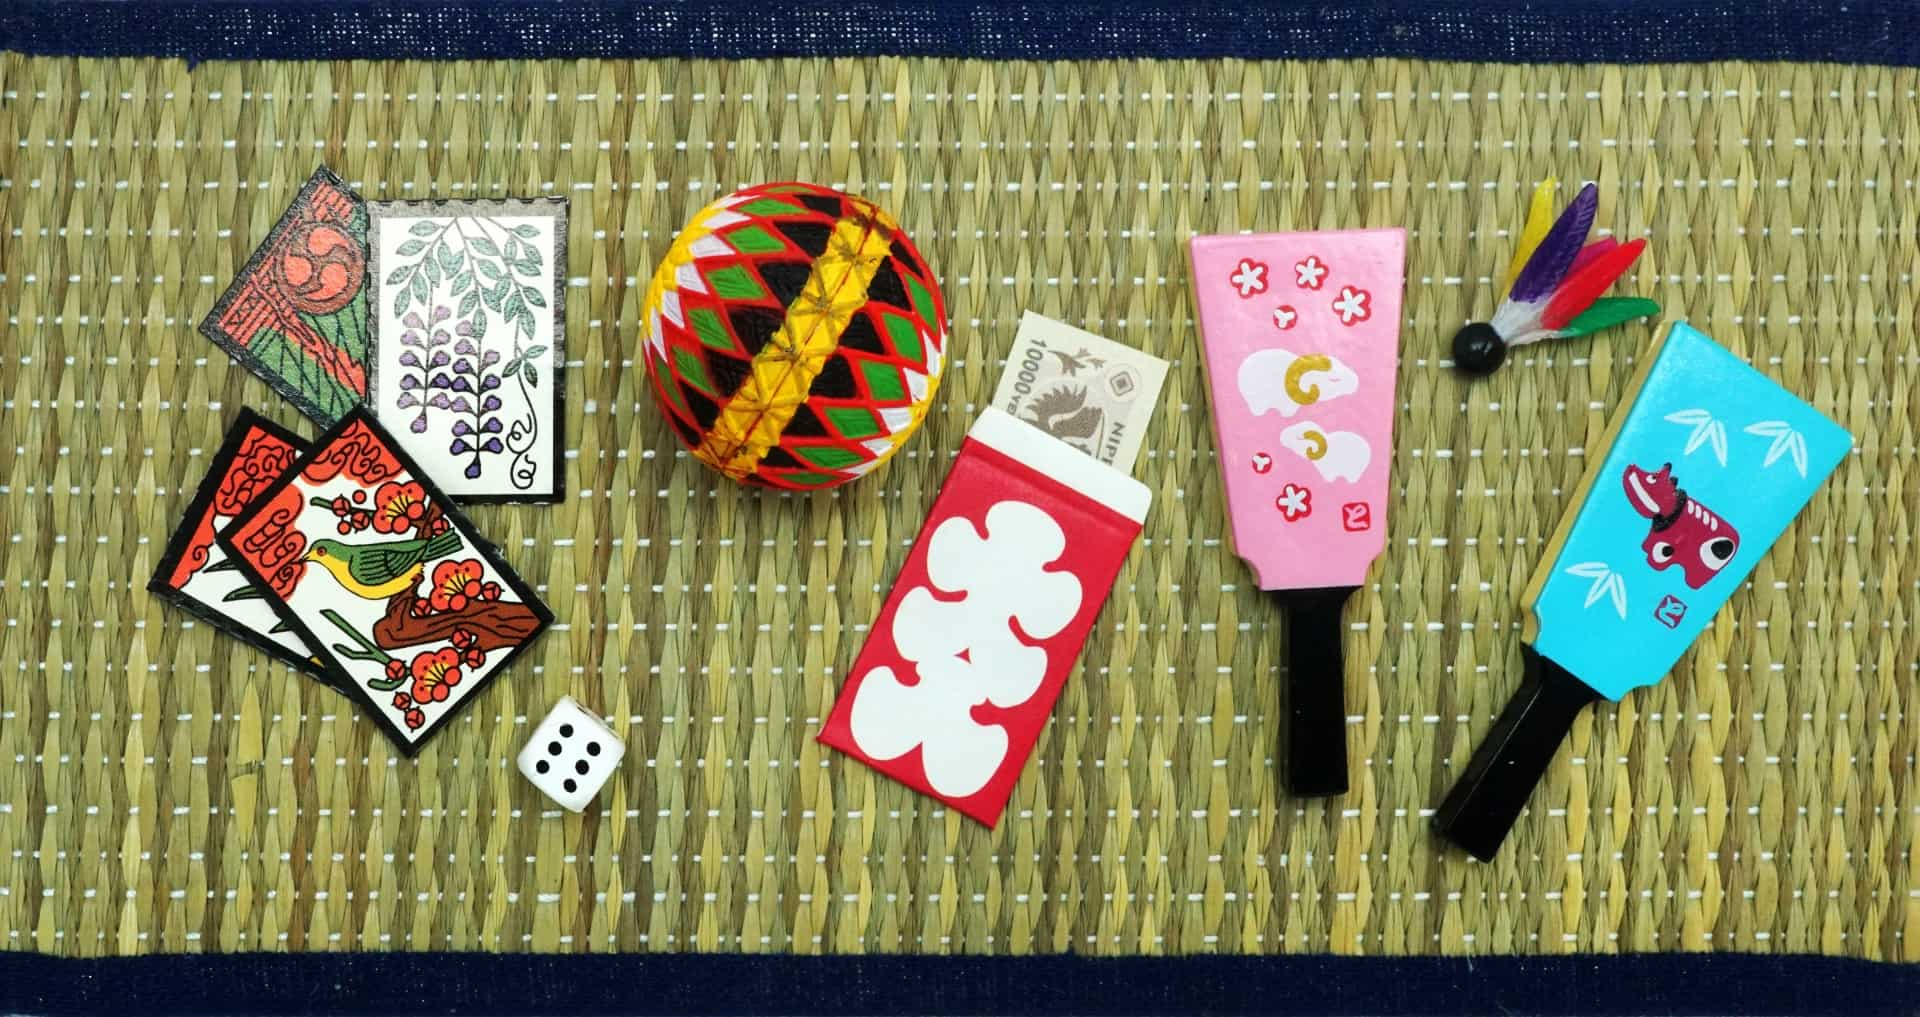 Ochotama, New year japanese games